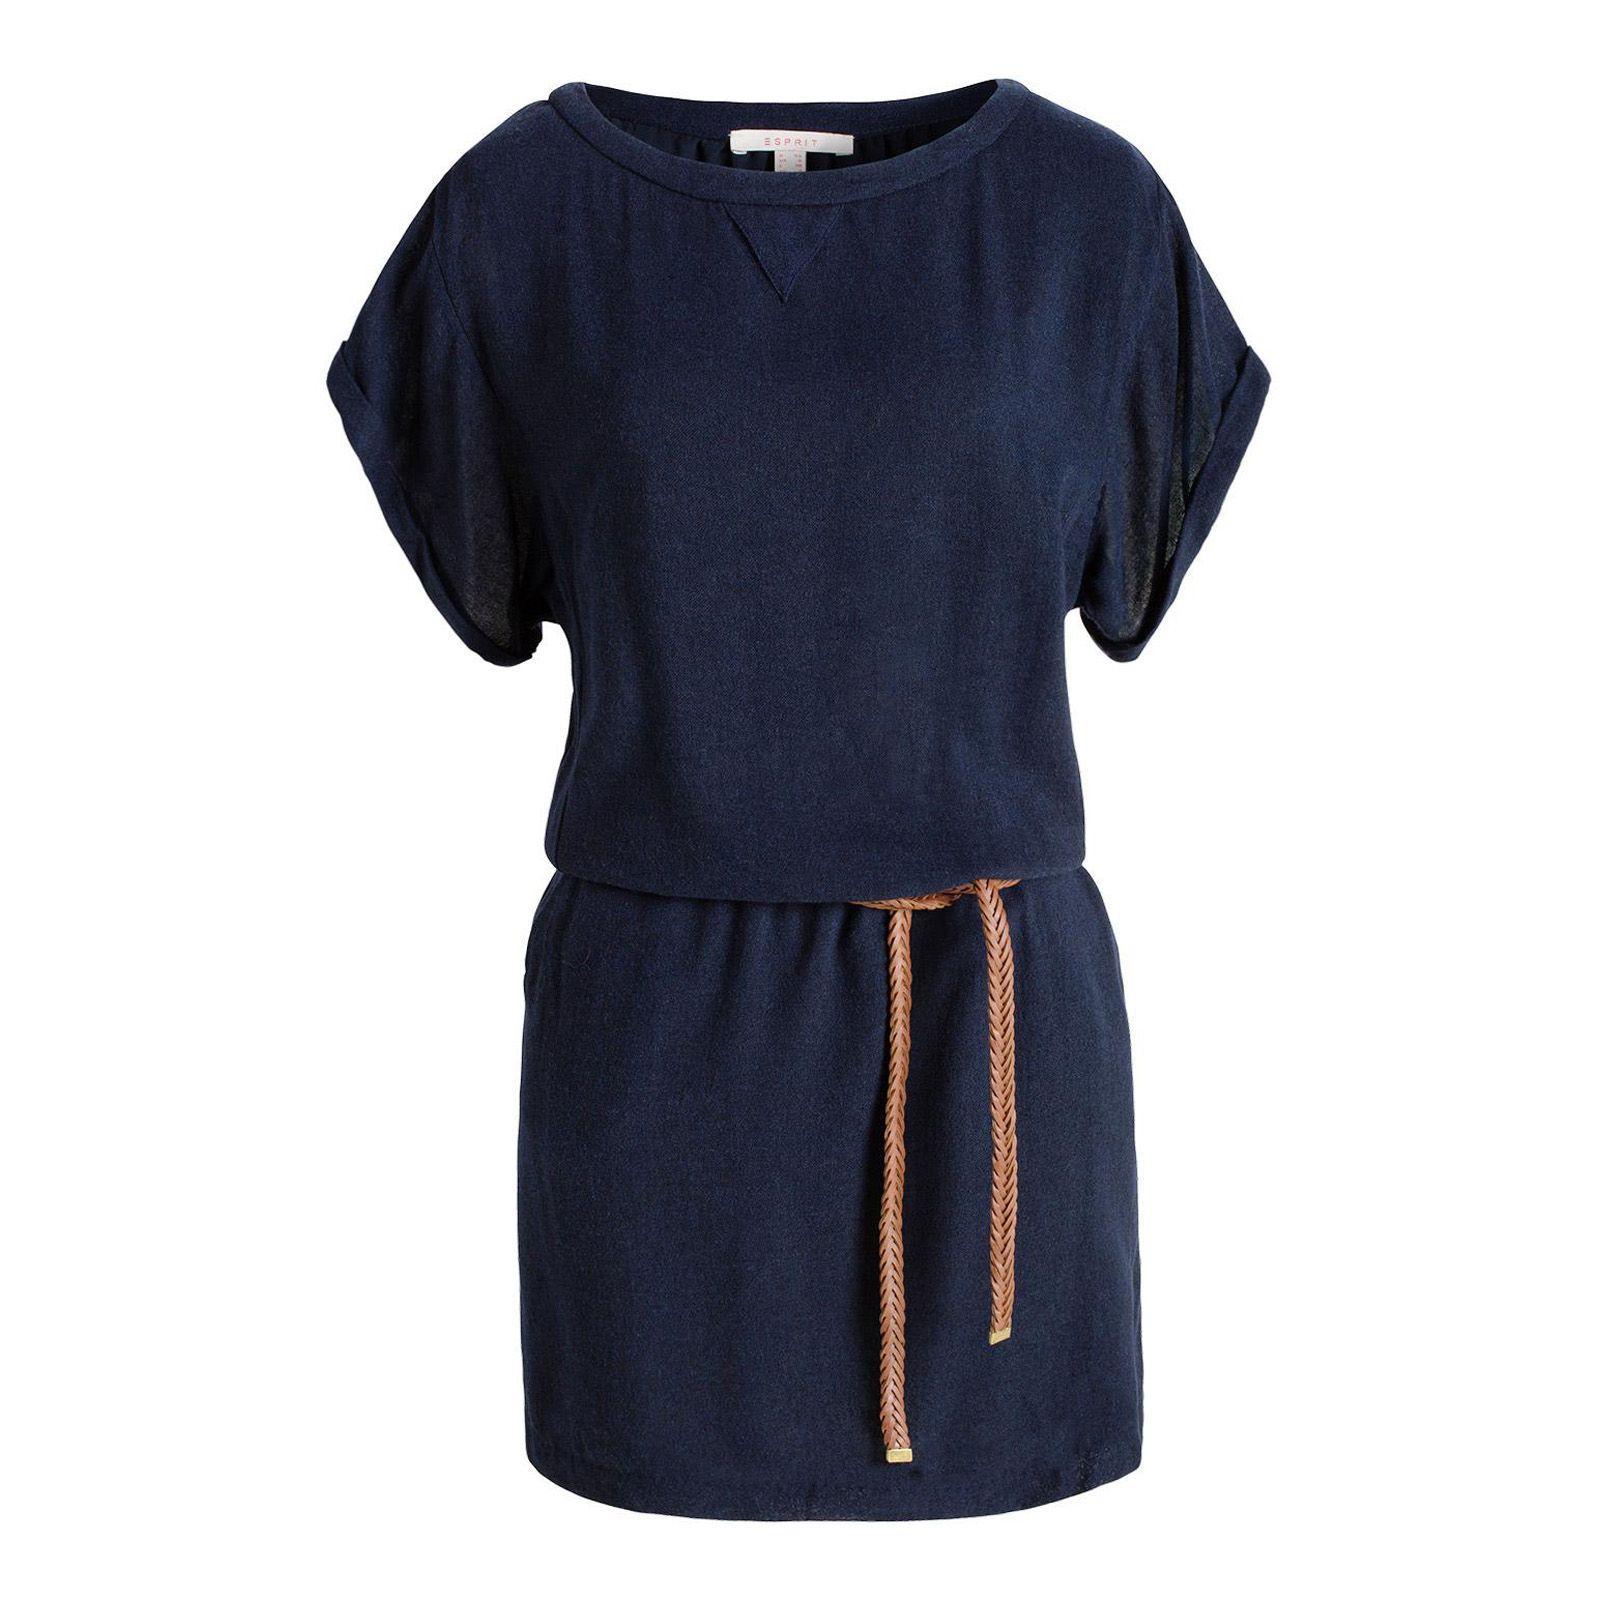 Esprit robe bleu marine